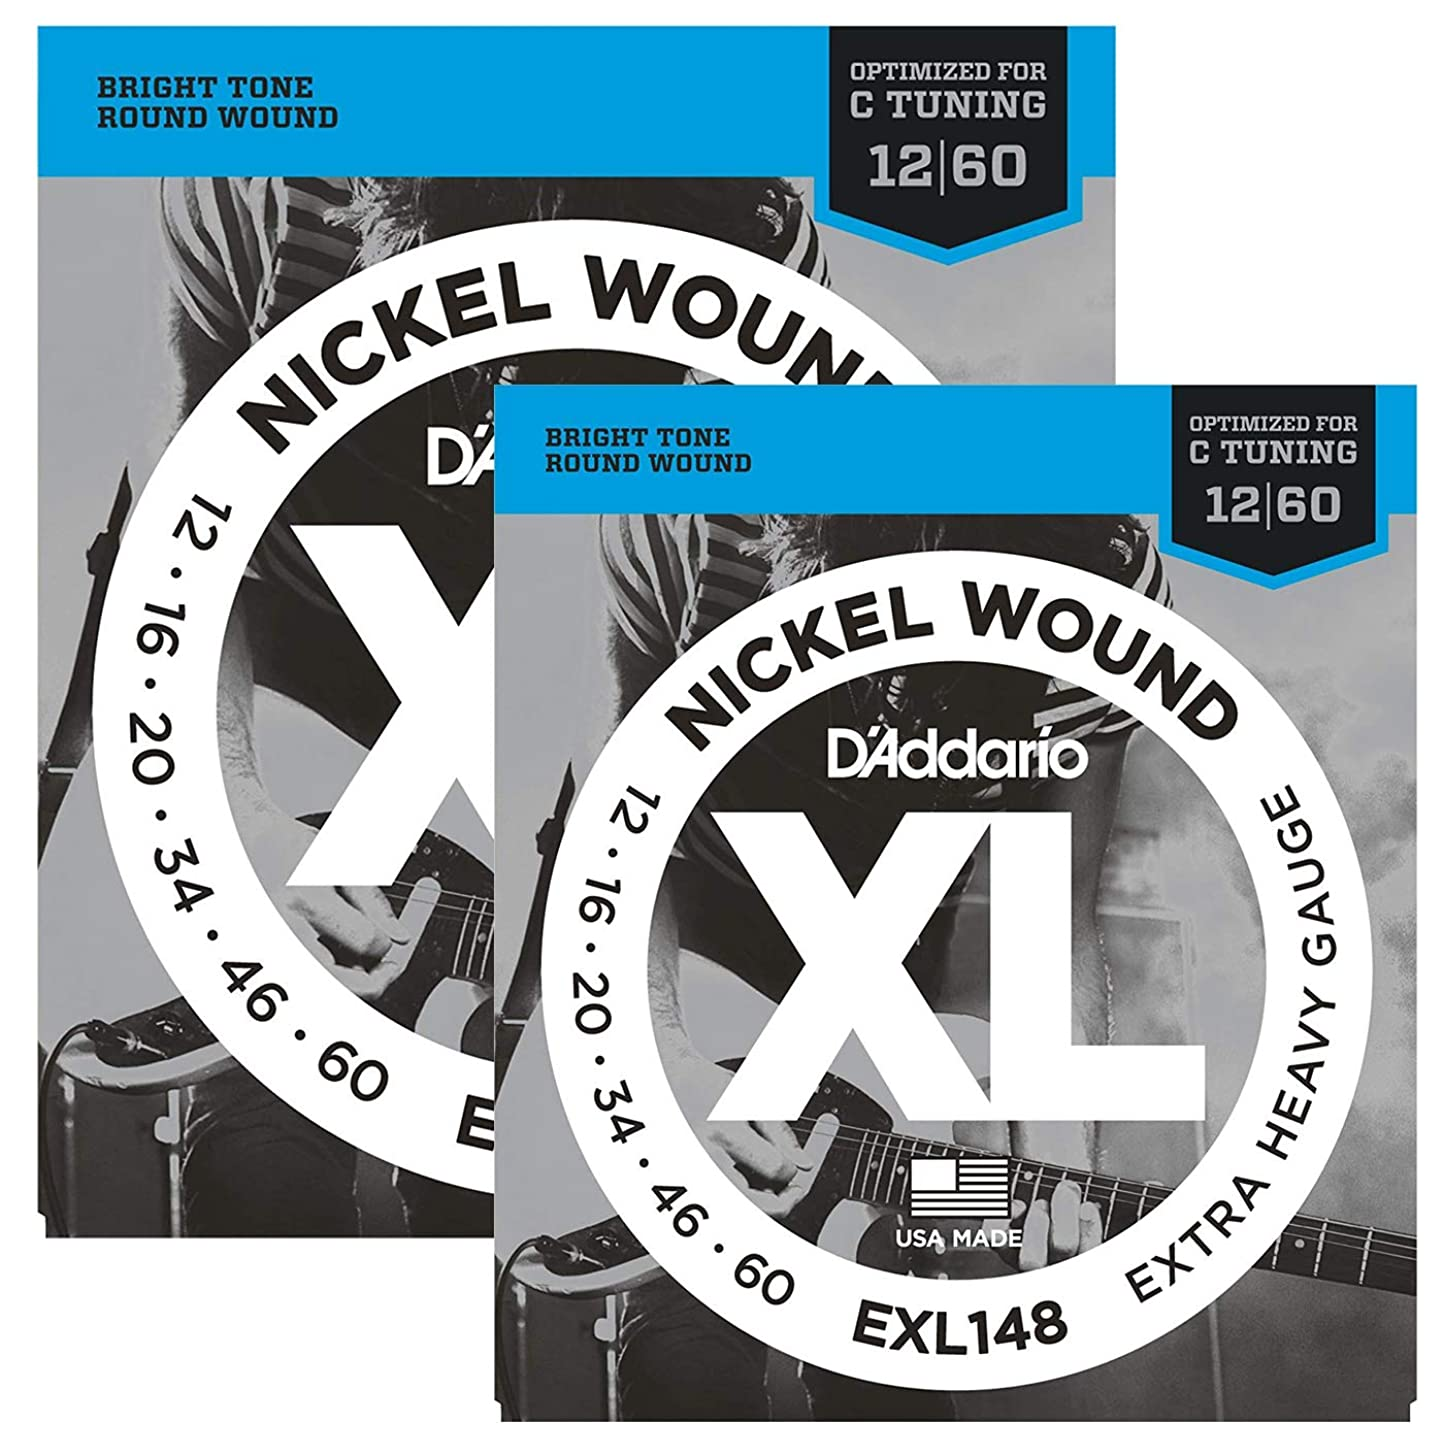 D'Addario EXL148x5 (5 sets), XL Nick Rnd Wnd, Ex Hvy, (.012-.060)